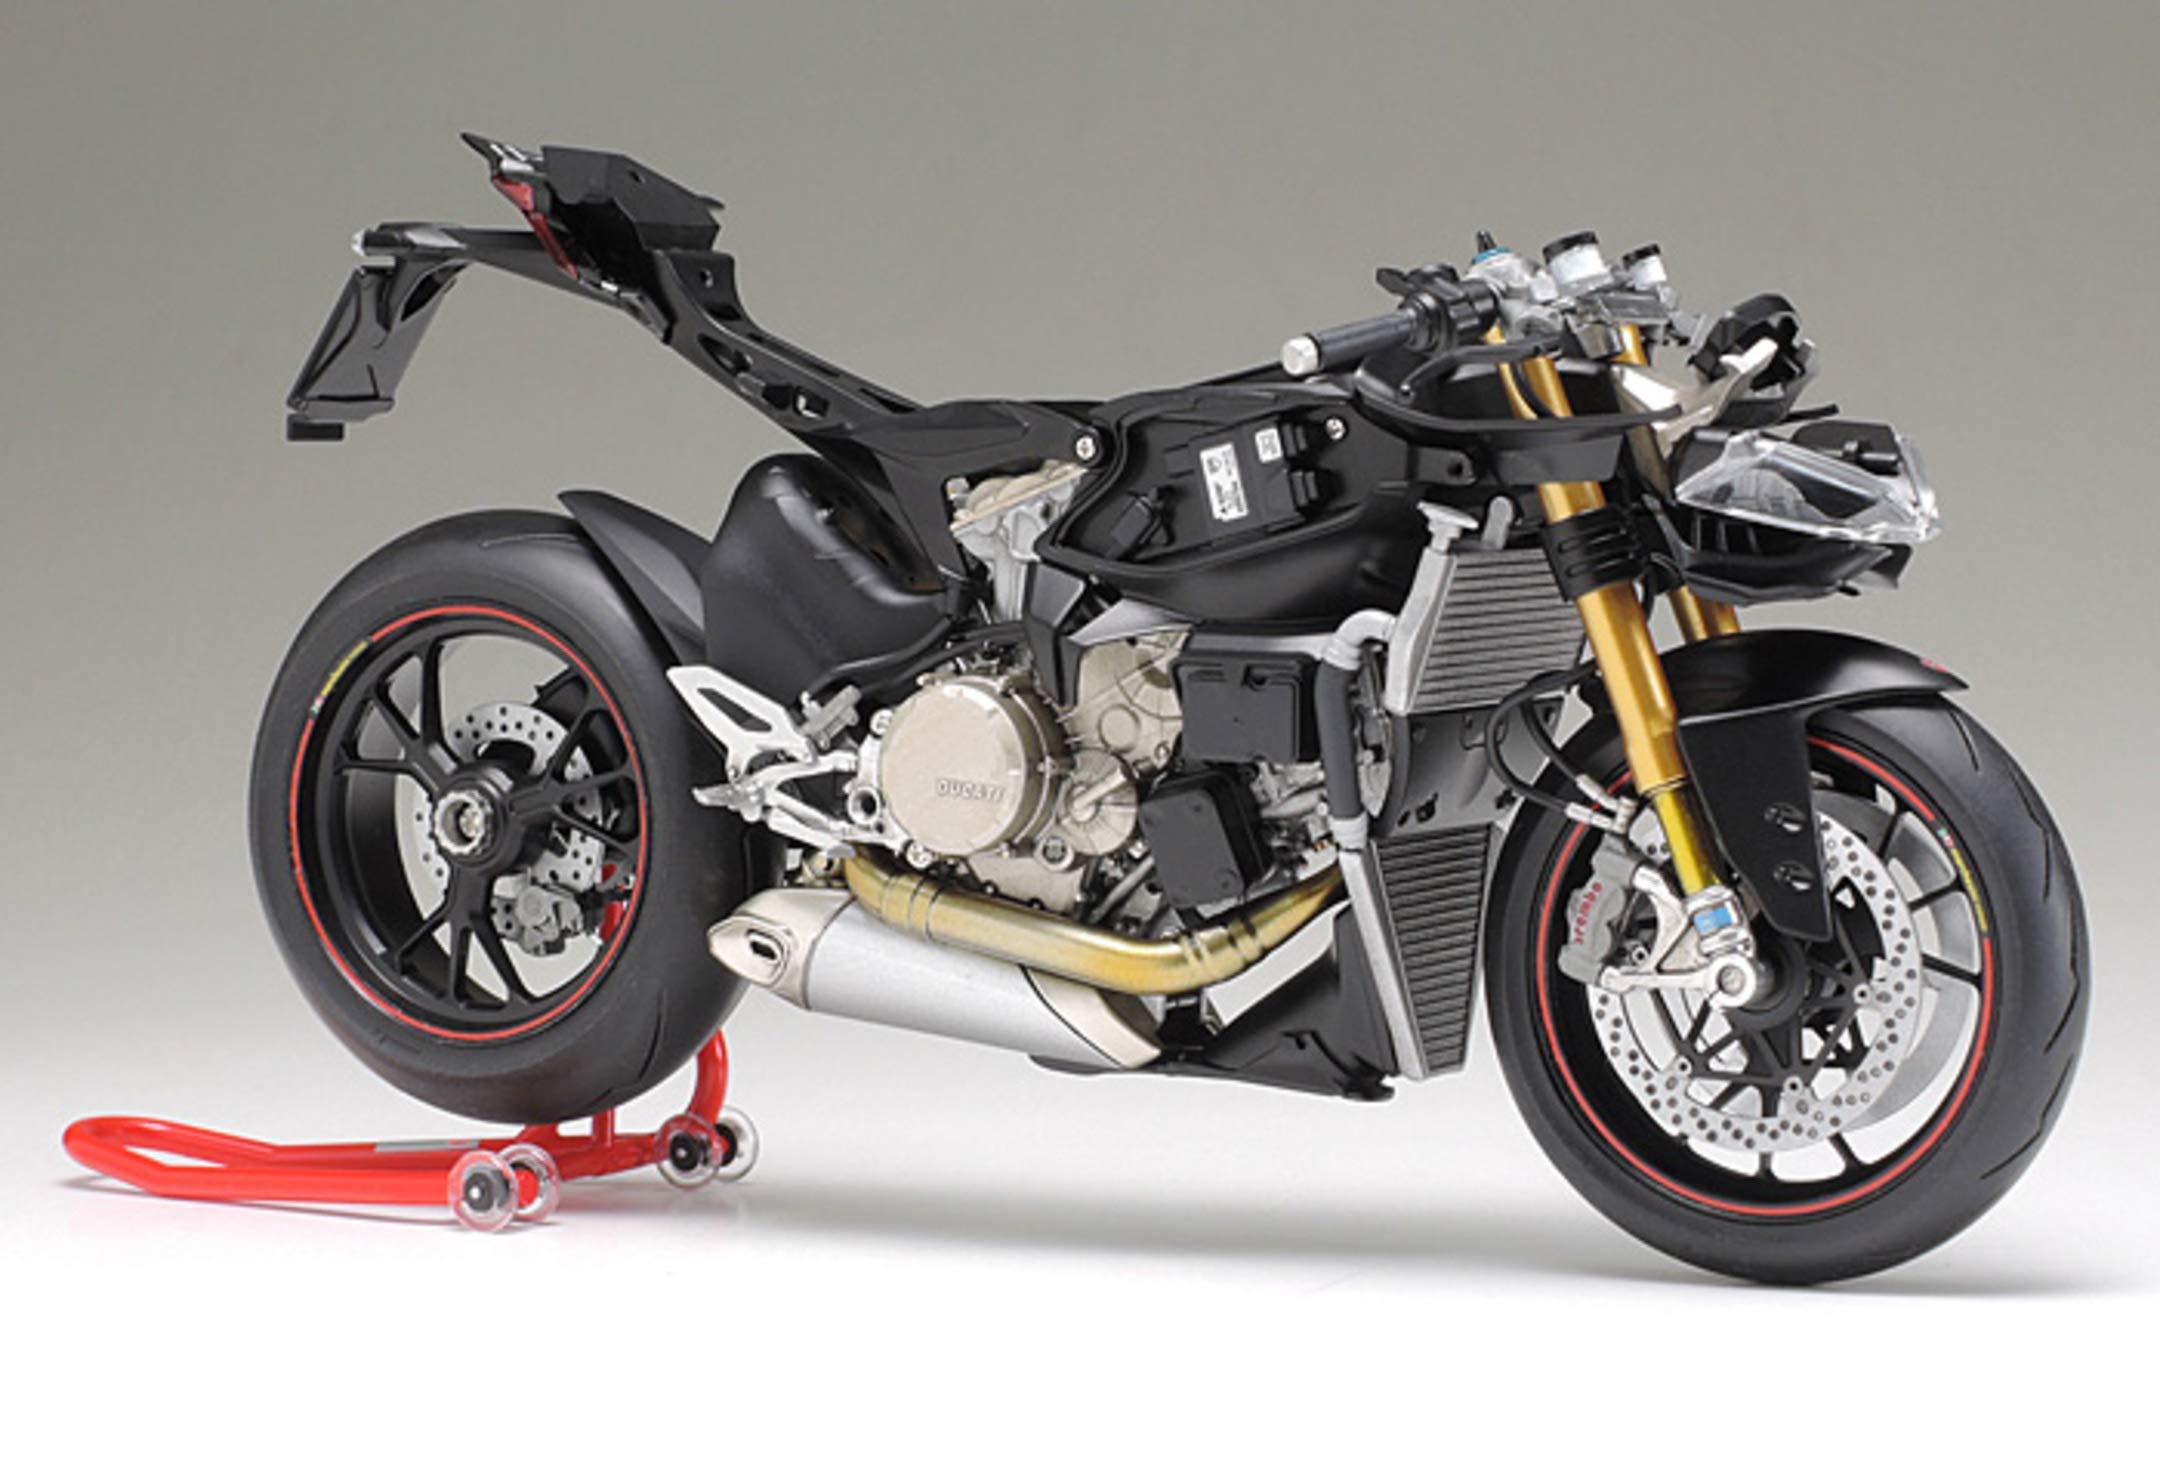 Tamiya 14129 1:12 Ducati 1199 Panigale S Model 7